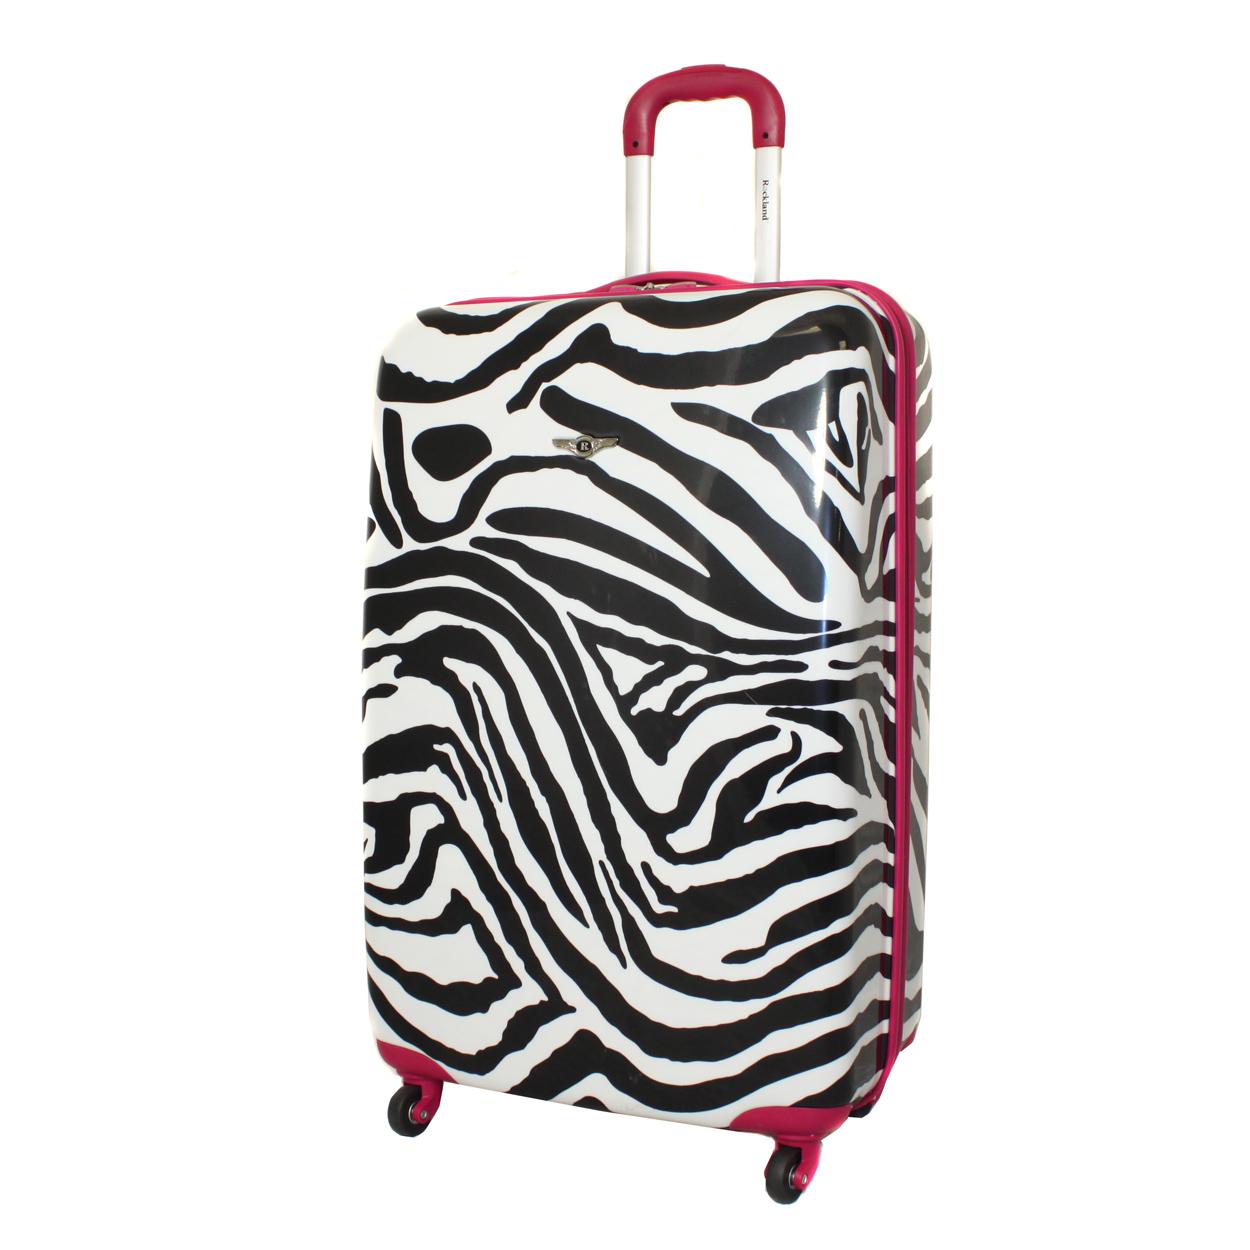 "Rockland 28"" Lightweight Hardside Spinner Upright Luggage Suitcase - Pink Zebra at Sears.com"